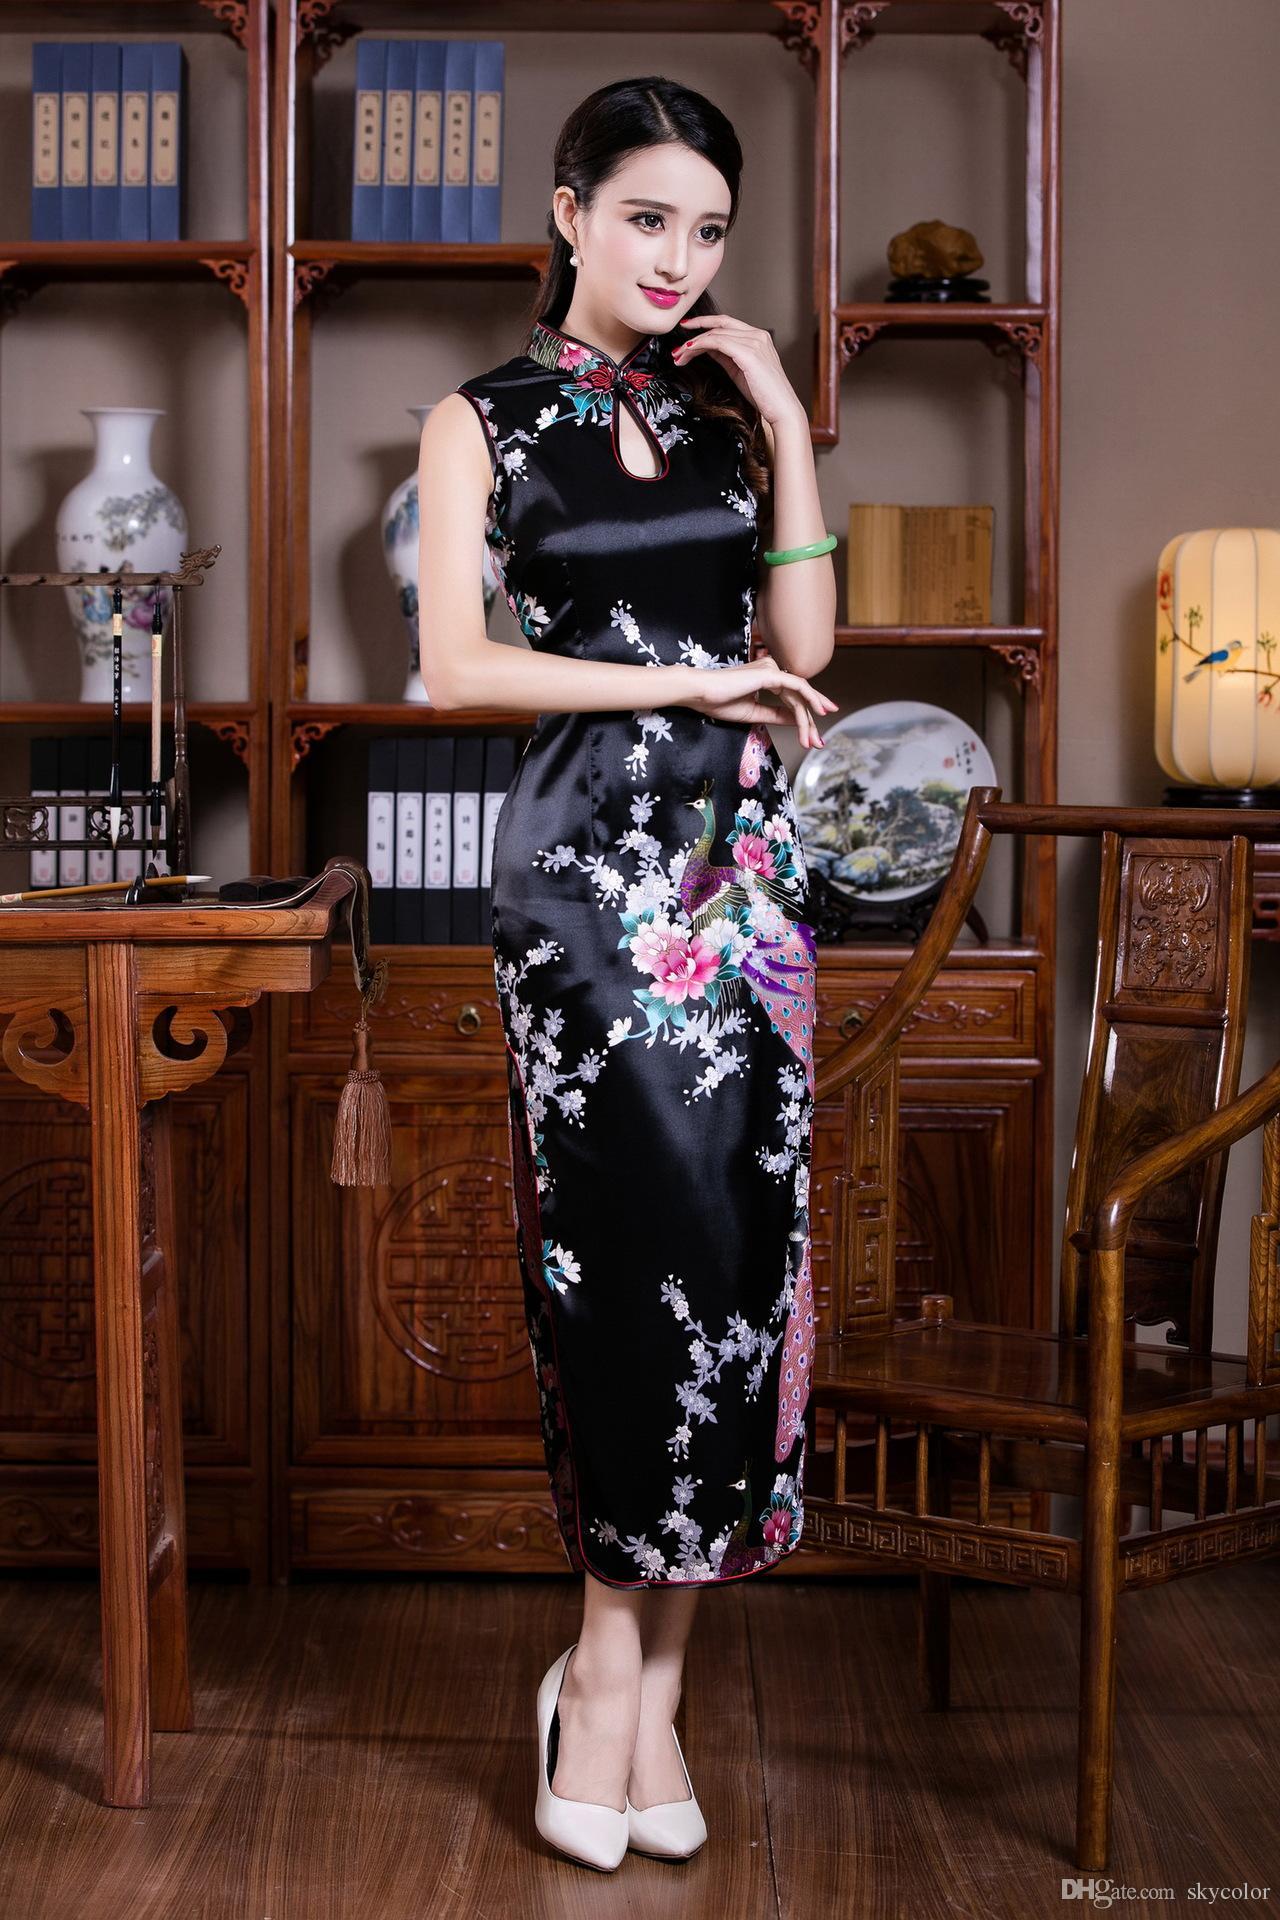 BLACK WHITE RED Blue Chinese Silk Satin Women's Dress Long Cheongsam Qipao Coat Skirt evening dress Bridal gown size S-3XL